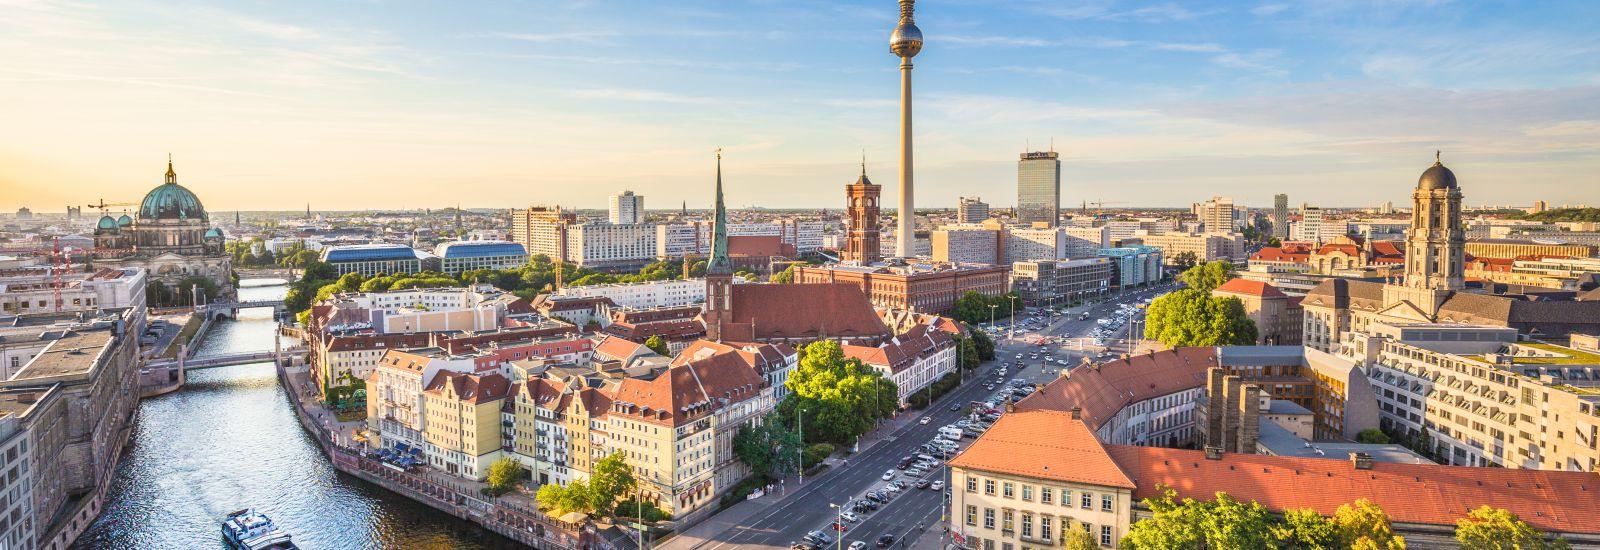 Panorama of the Berlin skyline.